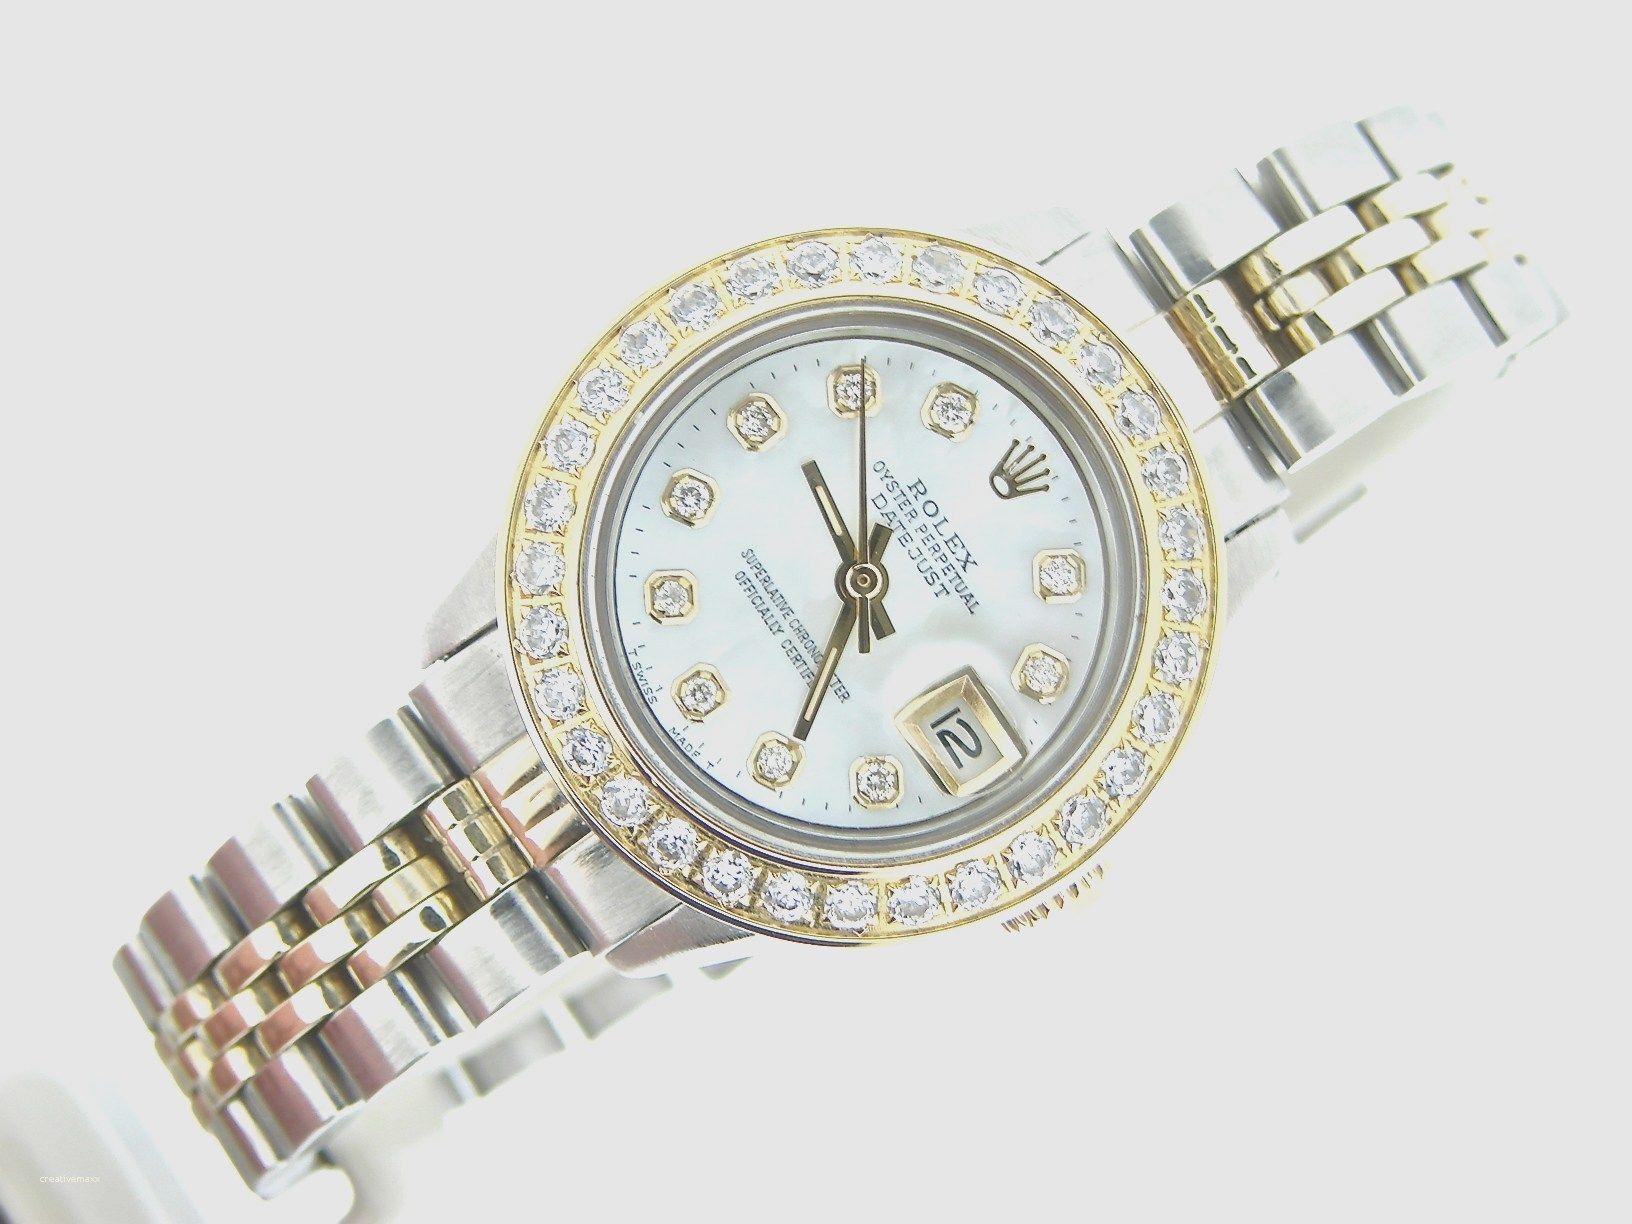 4da3d7df36d12 Ladies Luxury Watches - Inspirational Ladies Luxury Watches, Luxury Watches  Cheap Watches Mgc Gas